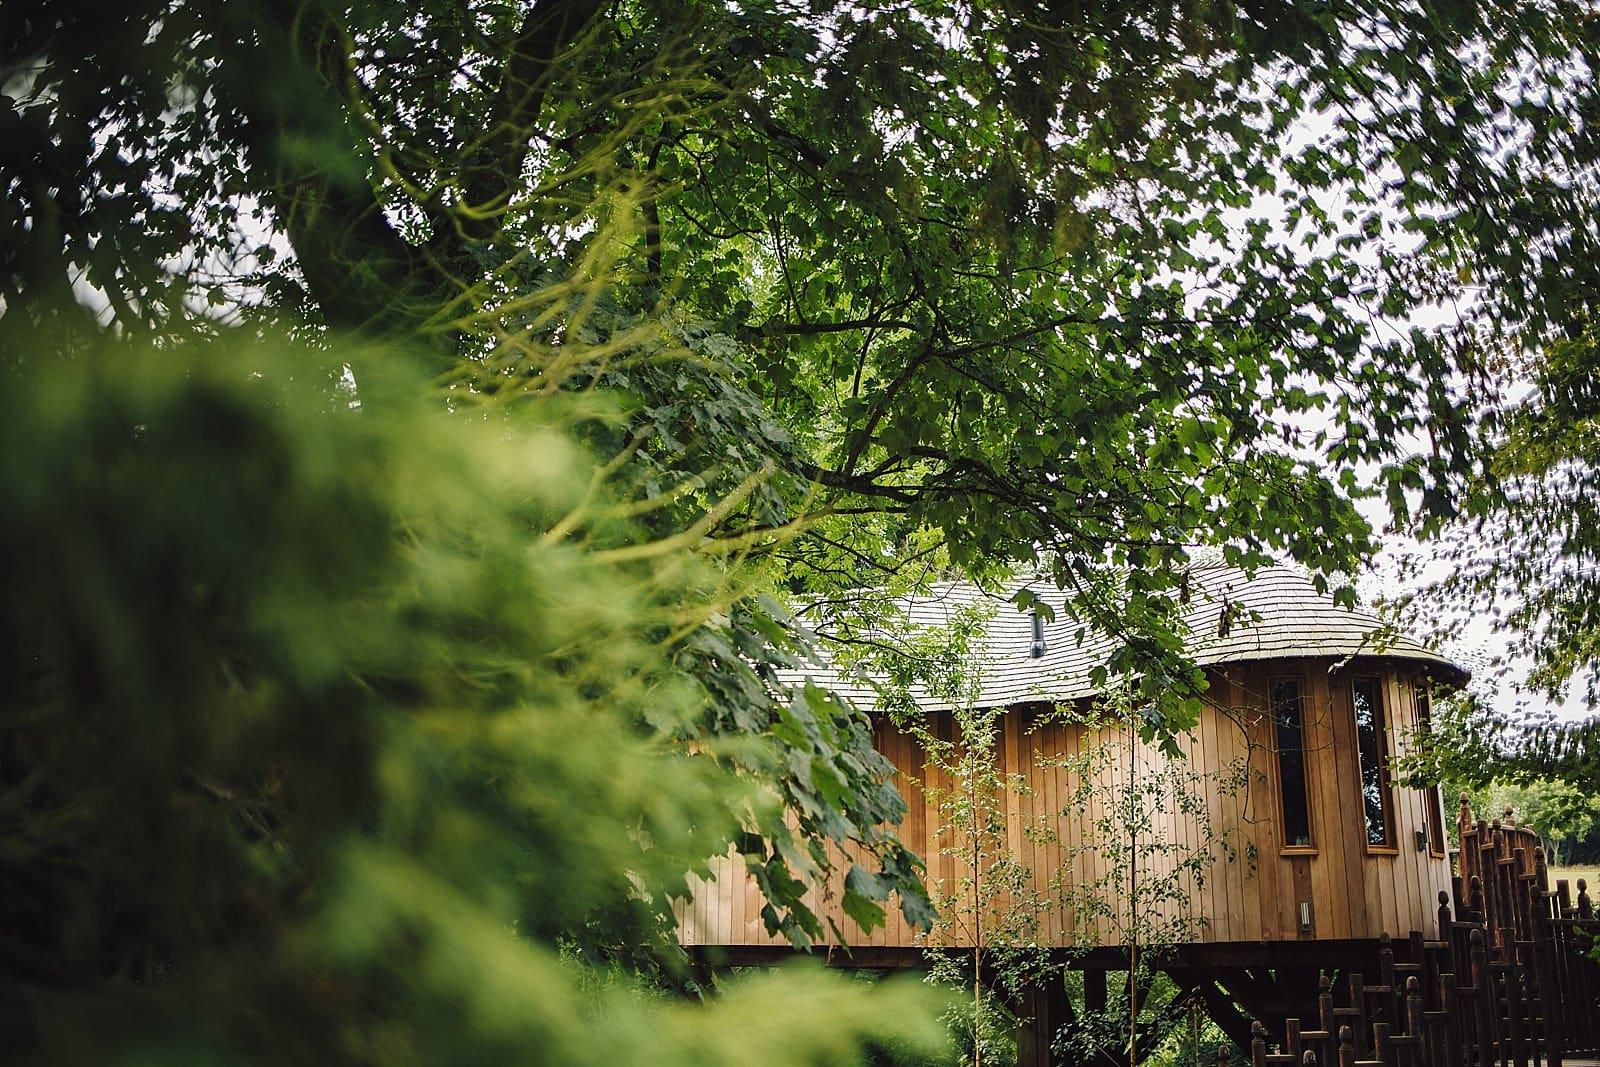 hothorpe-hall-woodlands-wedding-photography_0045